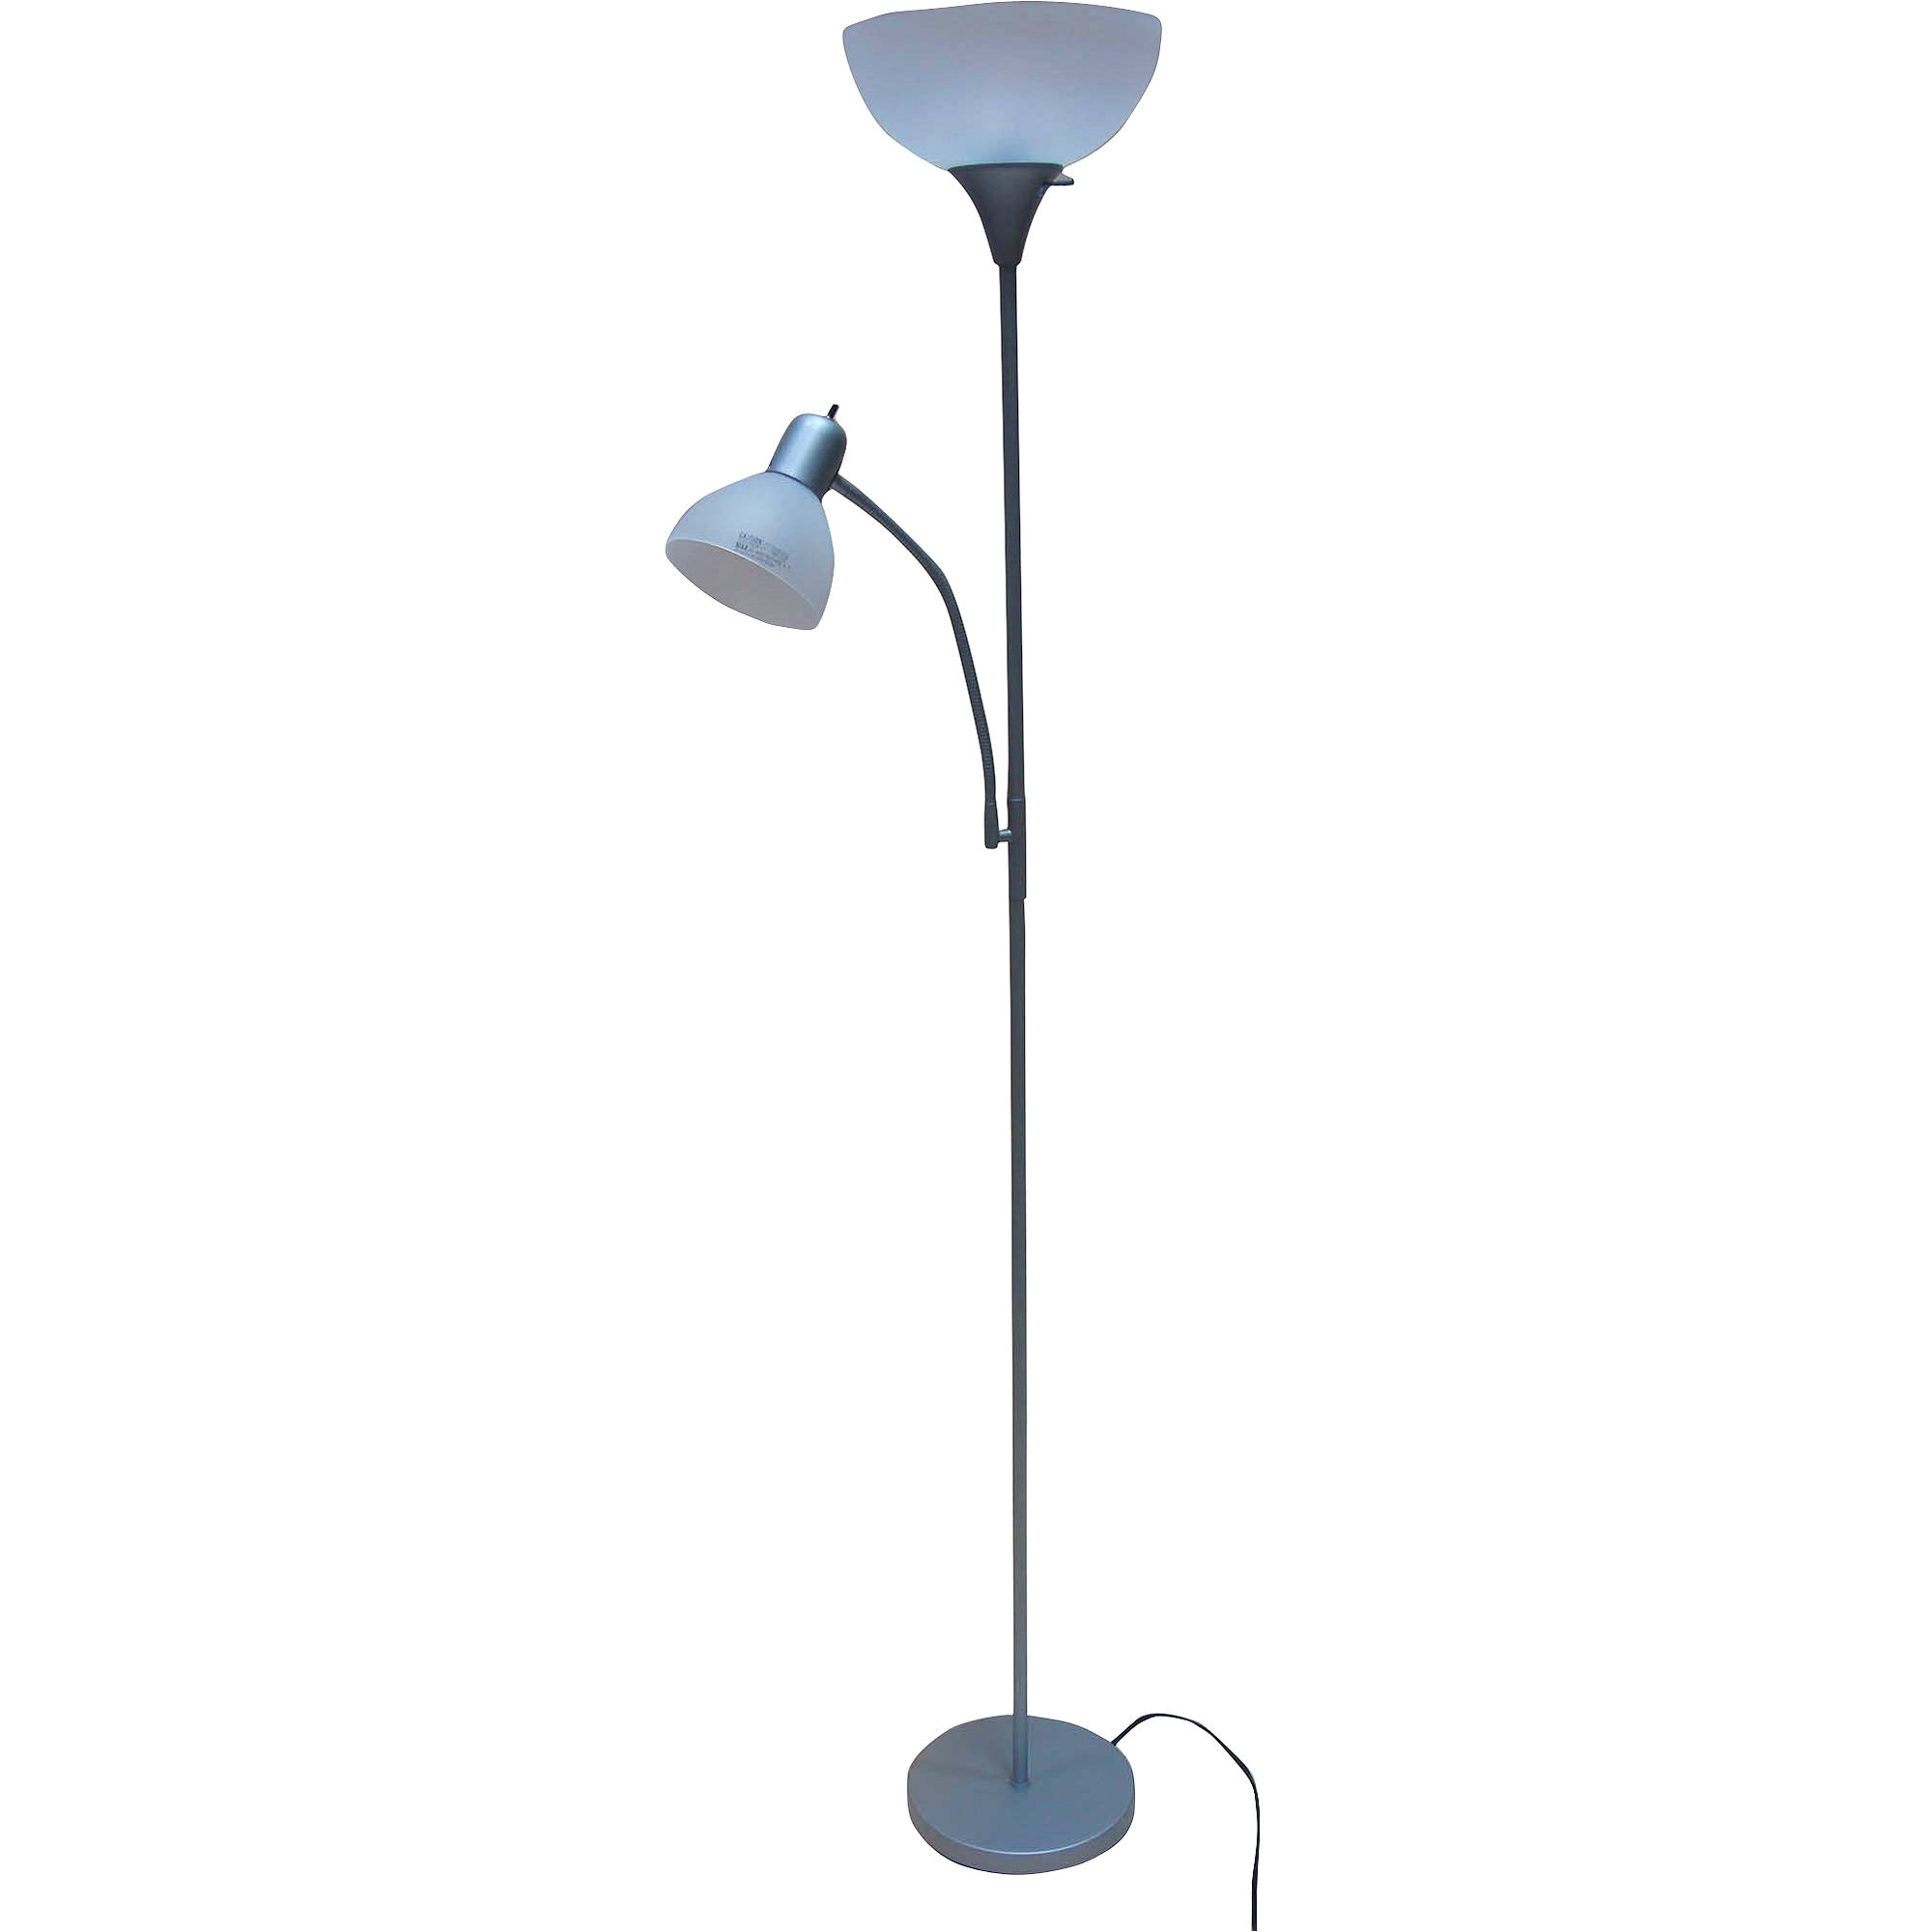 Intertek Floor Lamp Parts Lamps Amusing Intertek Floor Lamp Intertek Lamp Replacement Parts